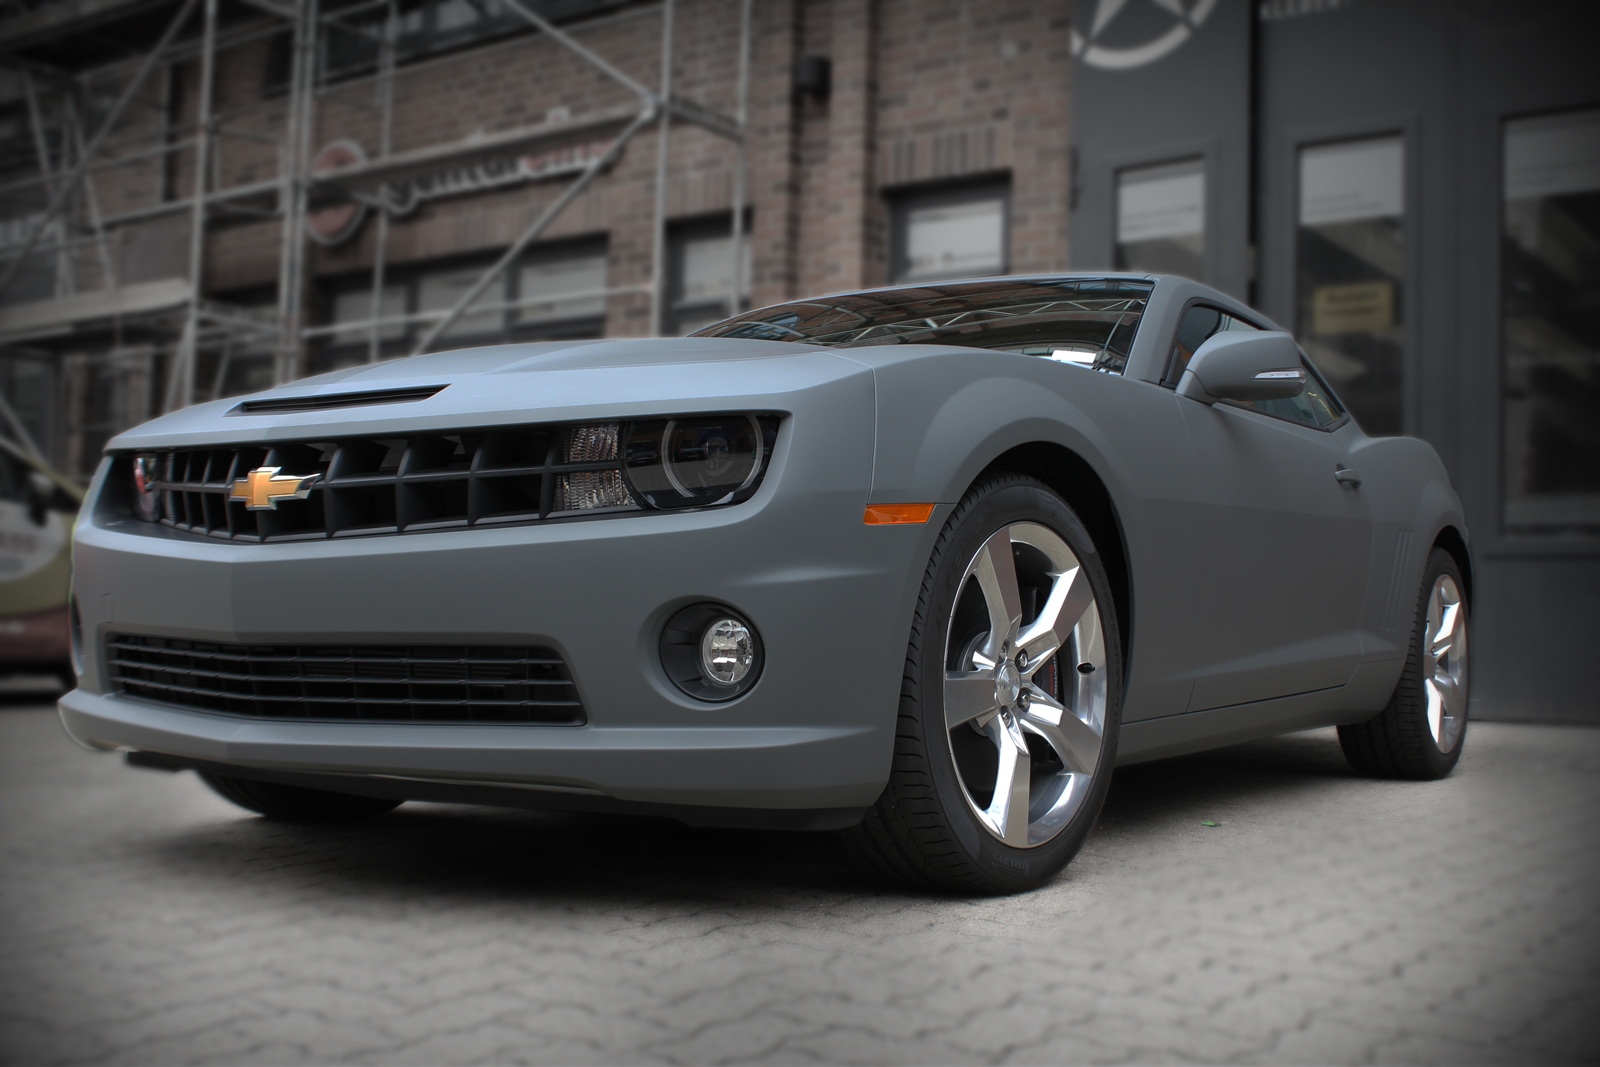 Dieser Chevrolet Camaro wurde komplett in grau matt foliert.